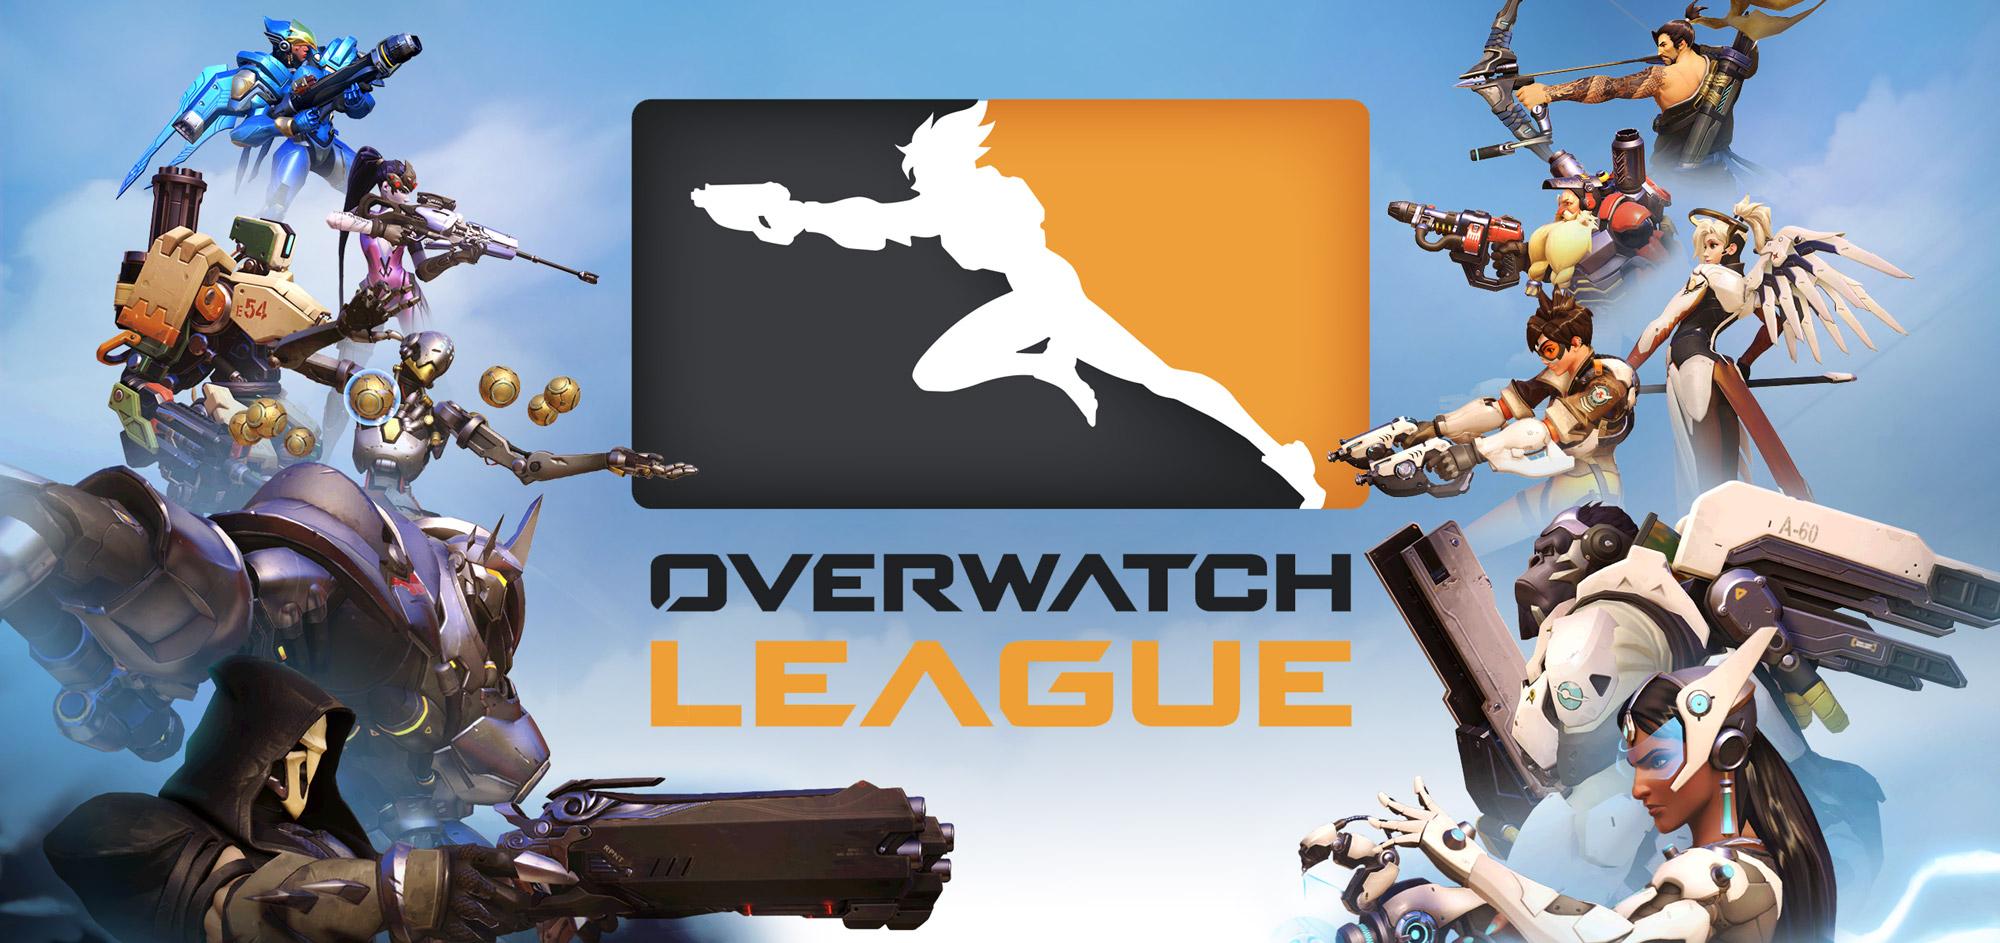 Overwatch Ligen